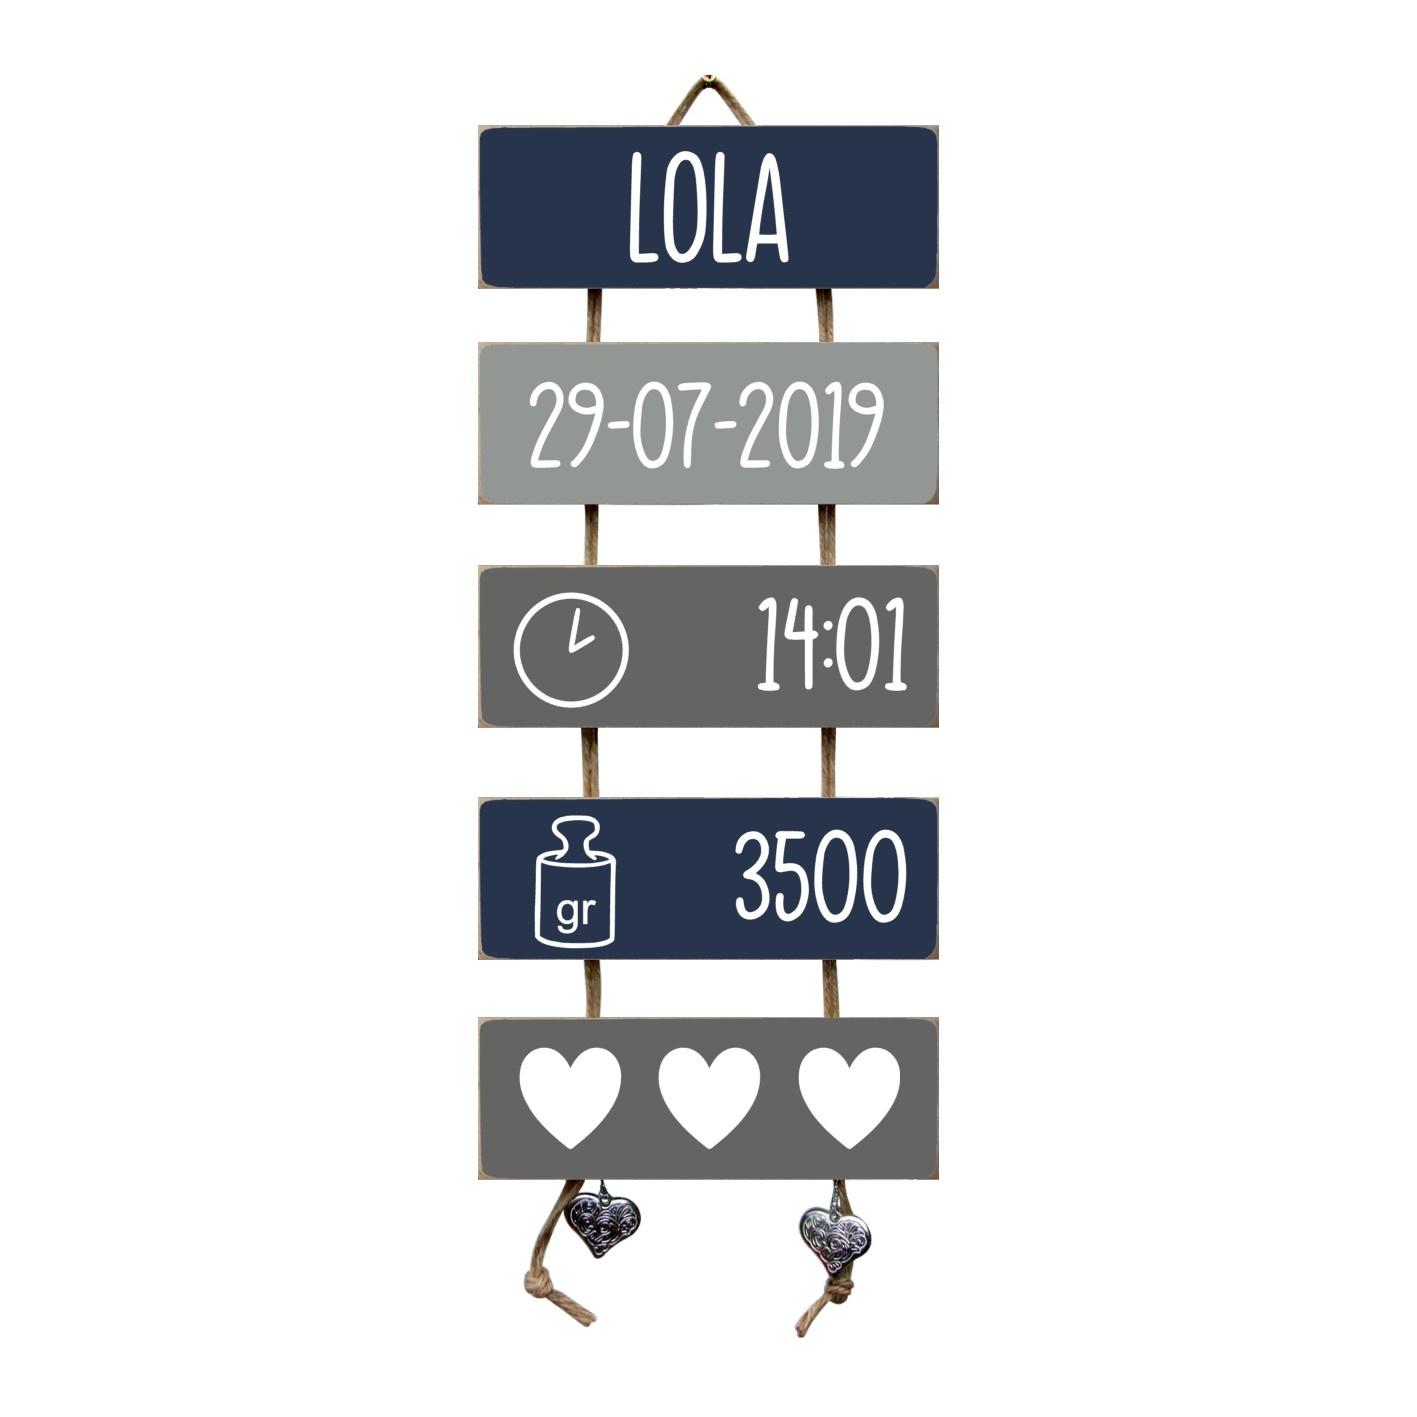 Kraamcadeau Geboorteladder Lola donkerblauw/grijs